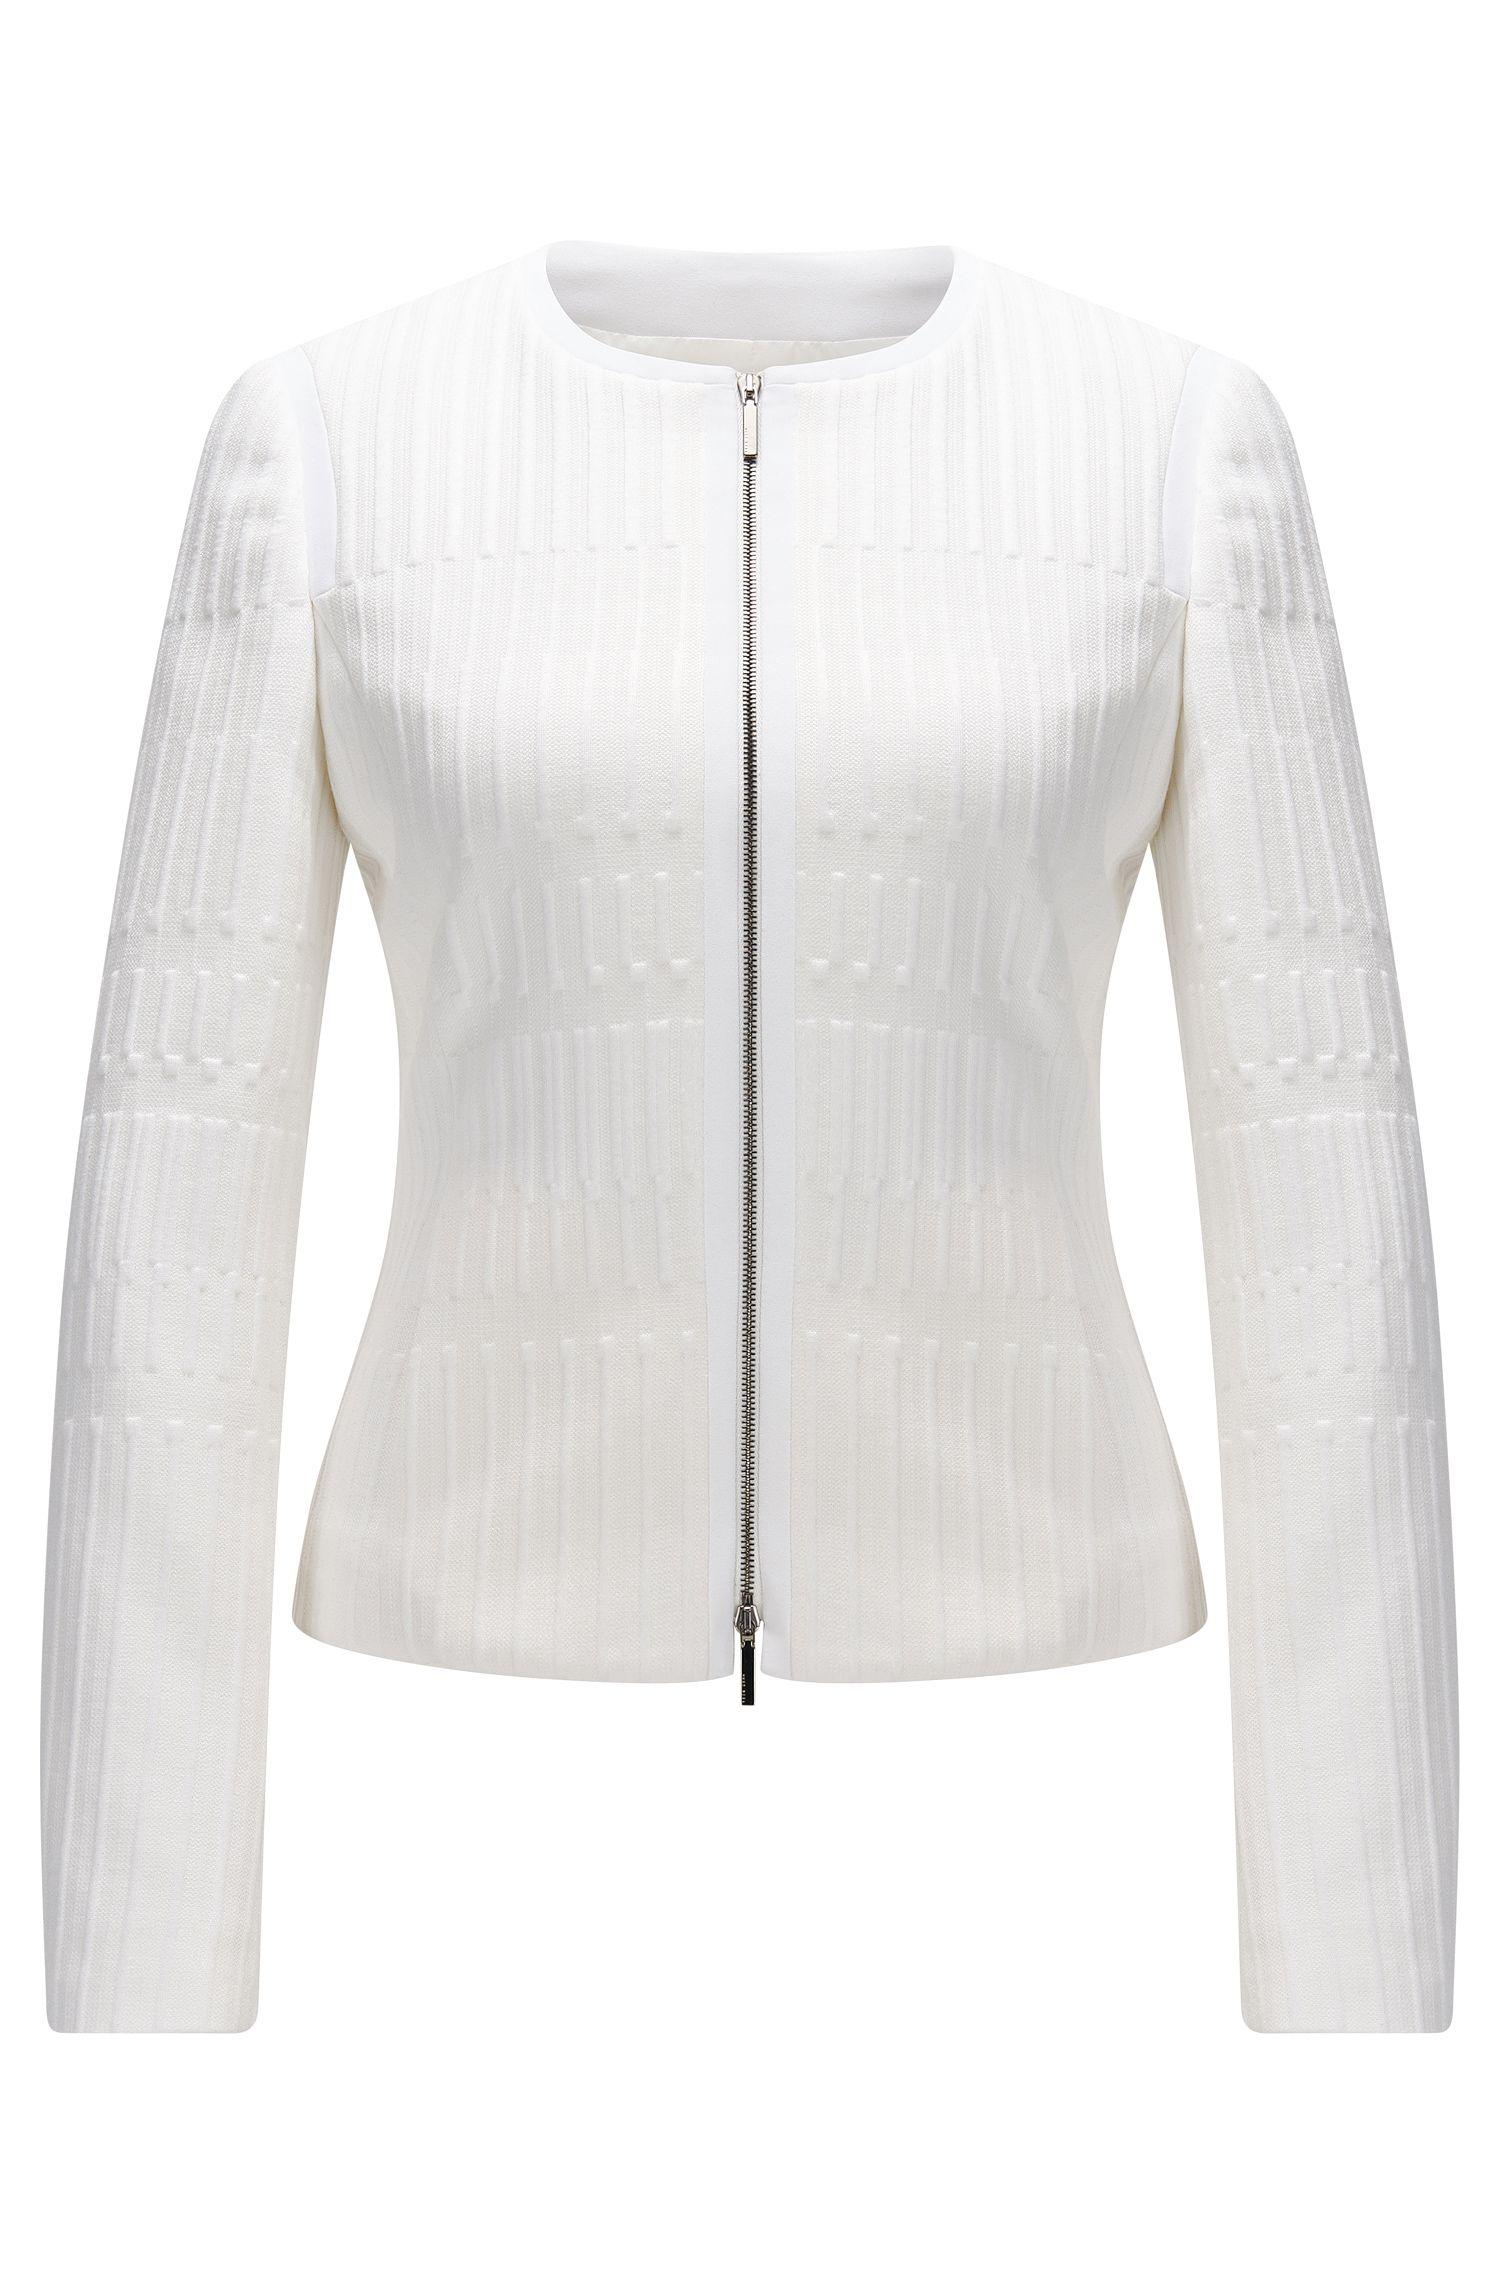 Regular-fit zip-through jacket in textured jersey jacquard